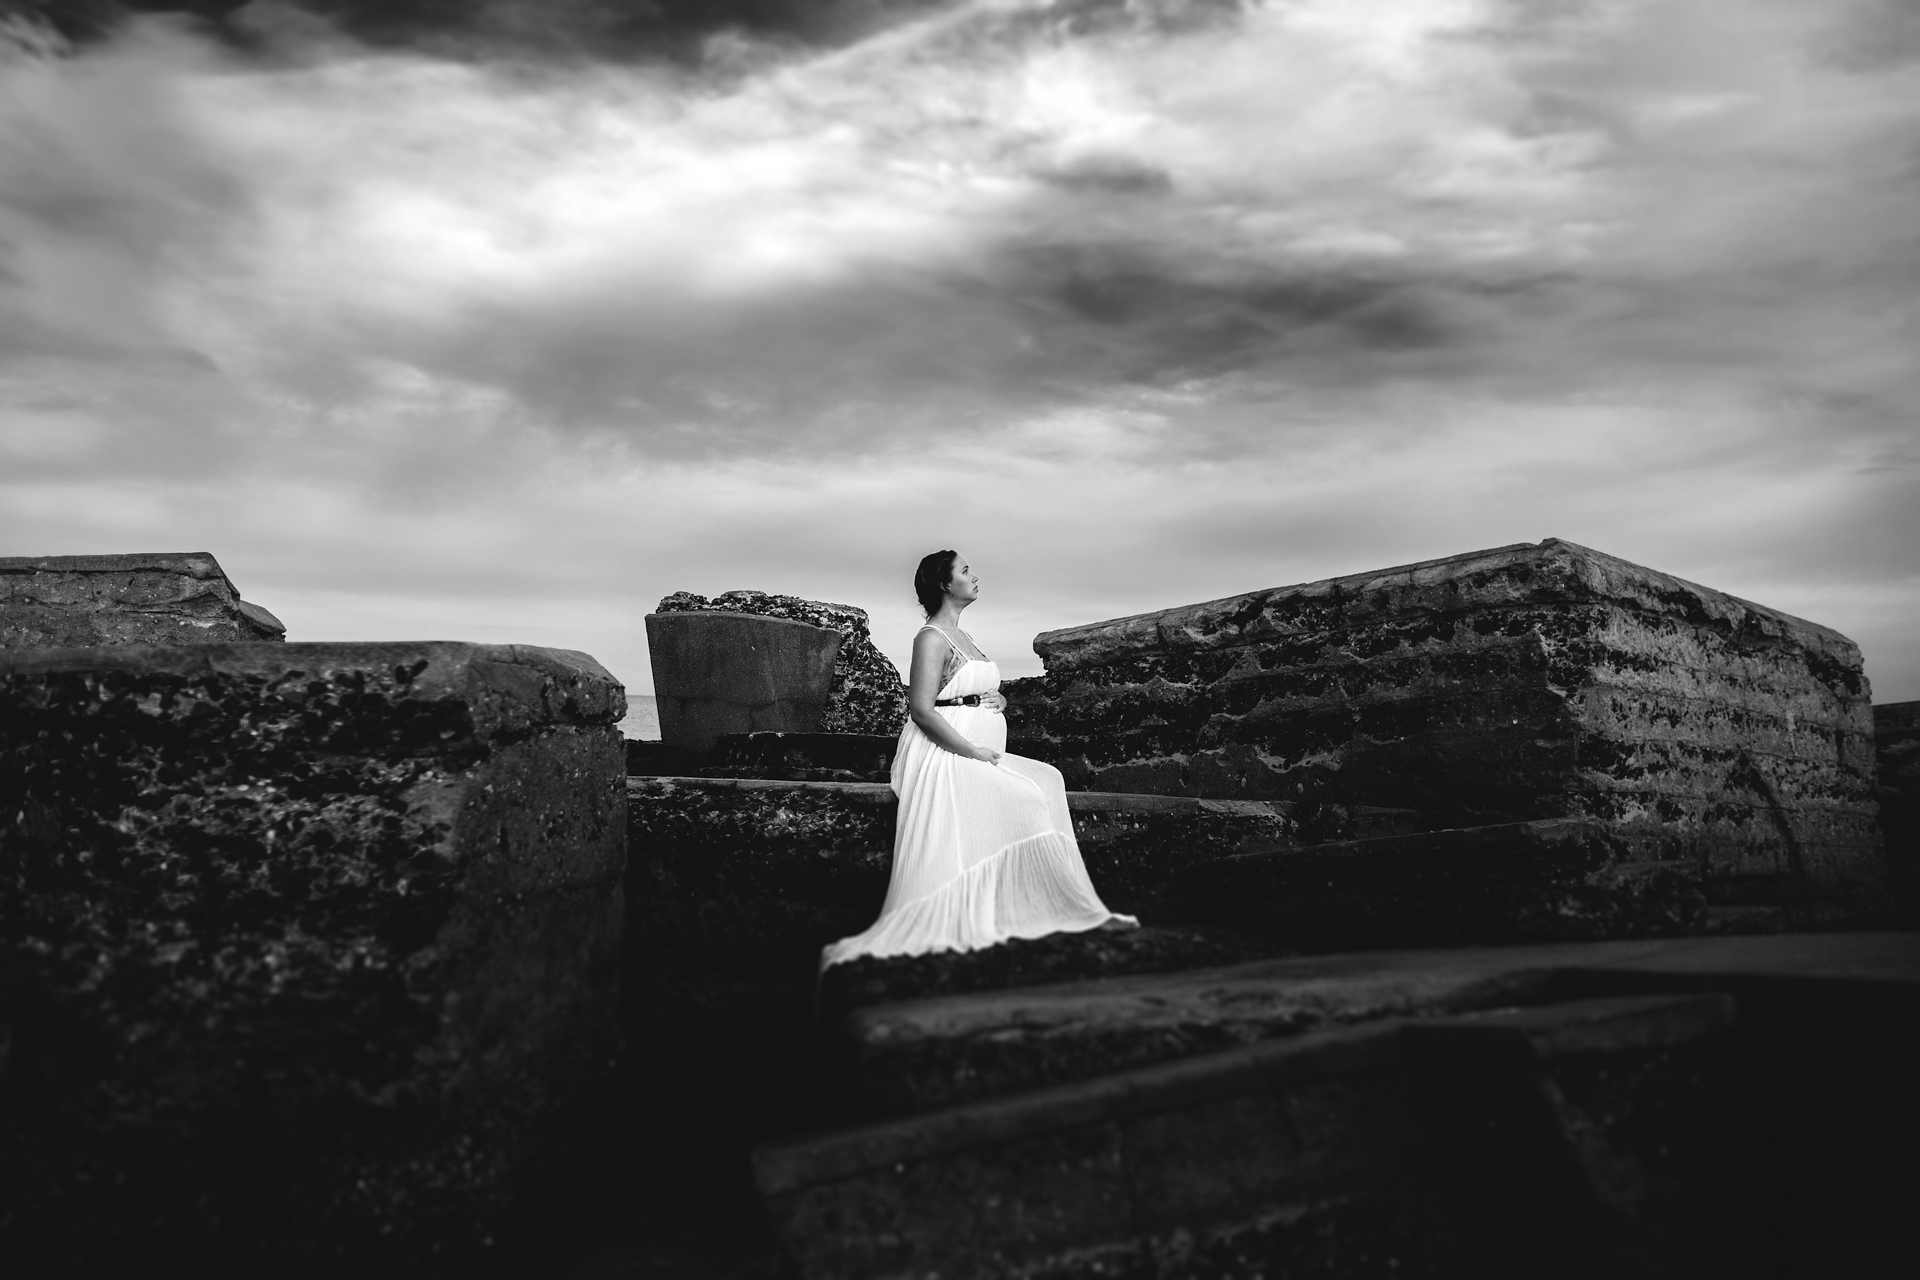 different maternity shoot ideas, tampa portrait photographer